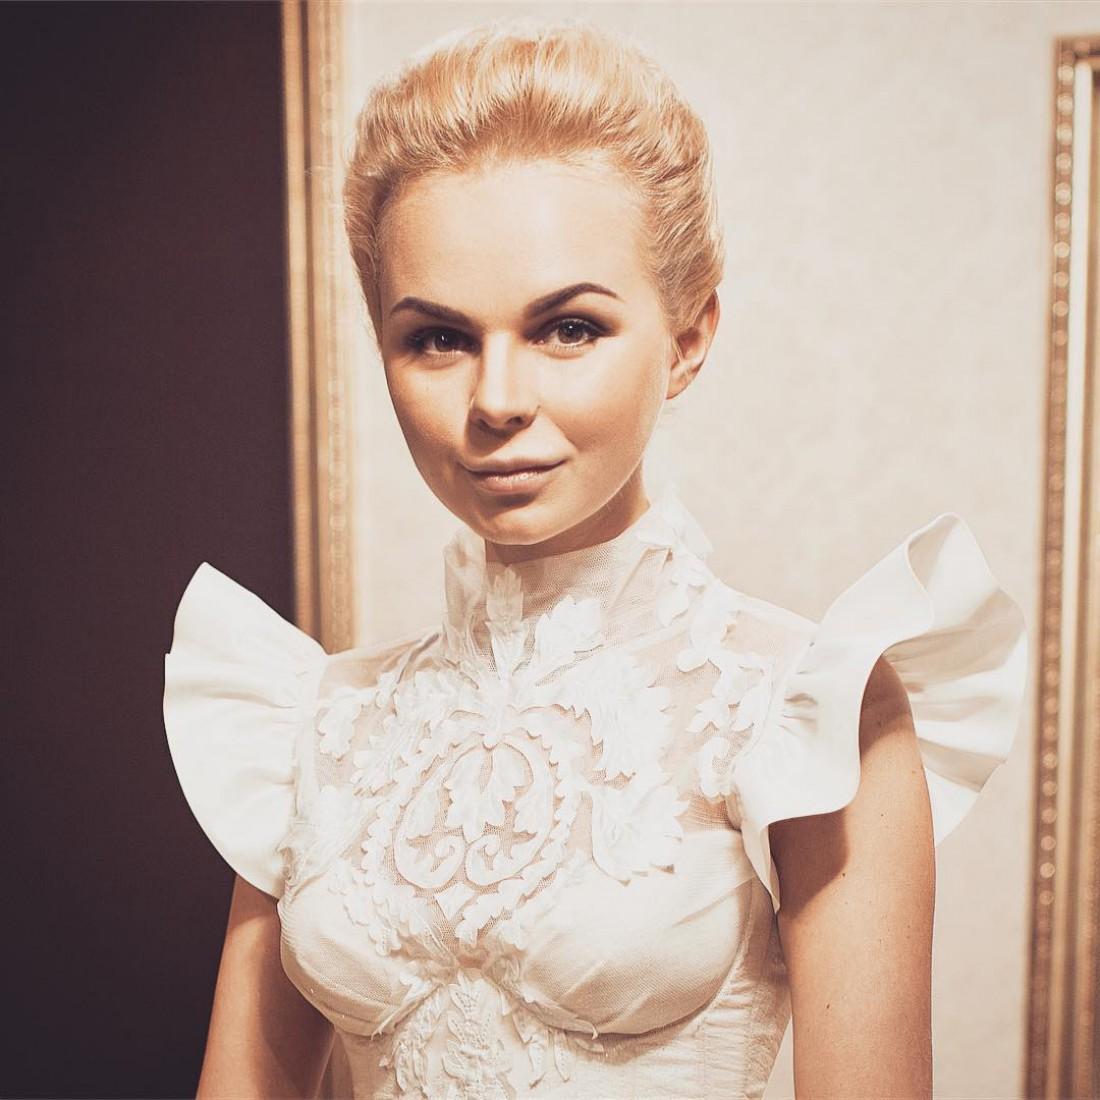 Вокс представила клип наремейк песни Кузьменко «Ночи»